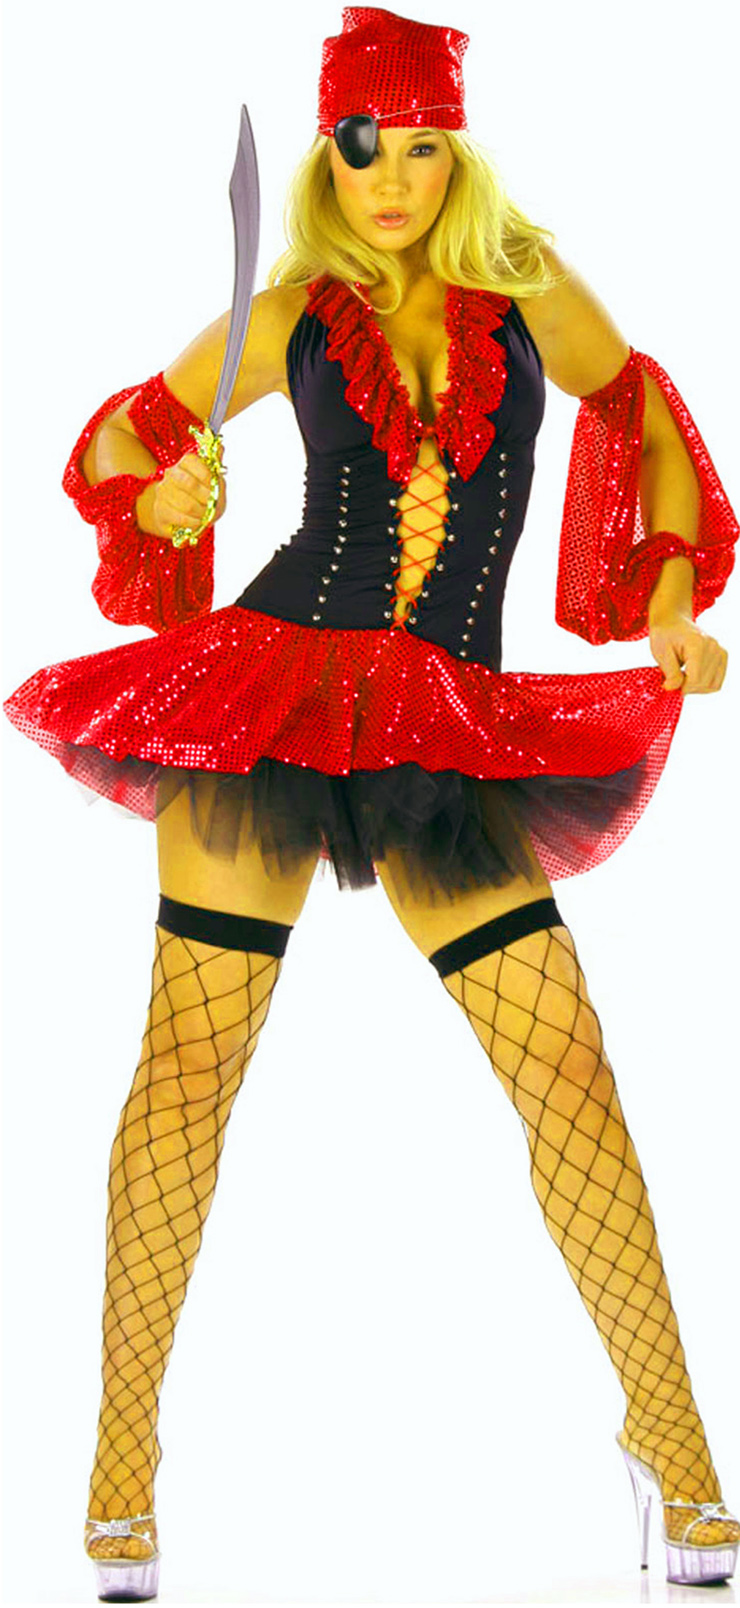 Deluxe Sequin Pirate Costume, Sequin Pirate Costume, Pirate Dress, #P1851